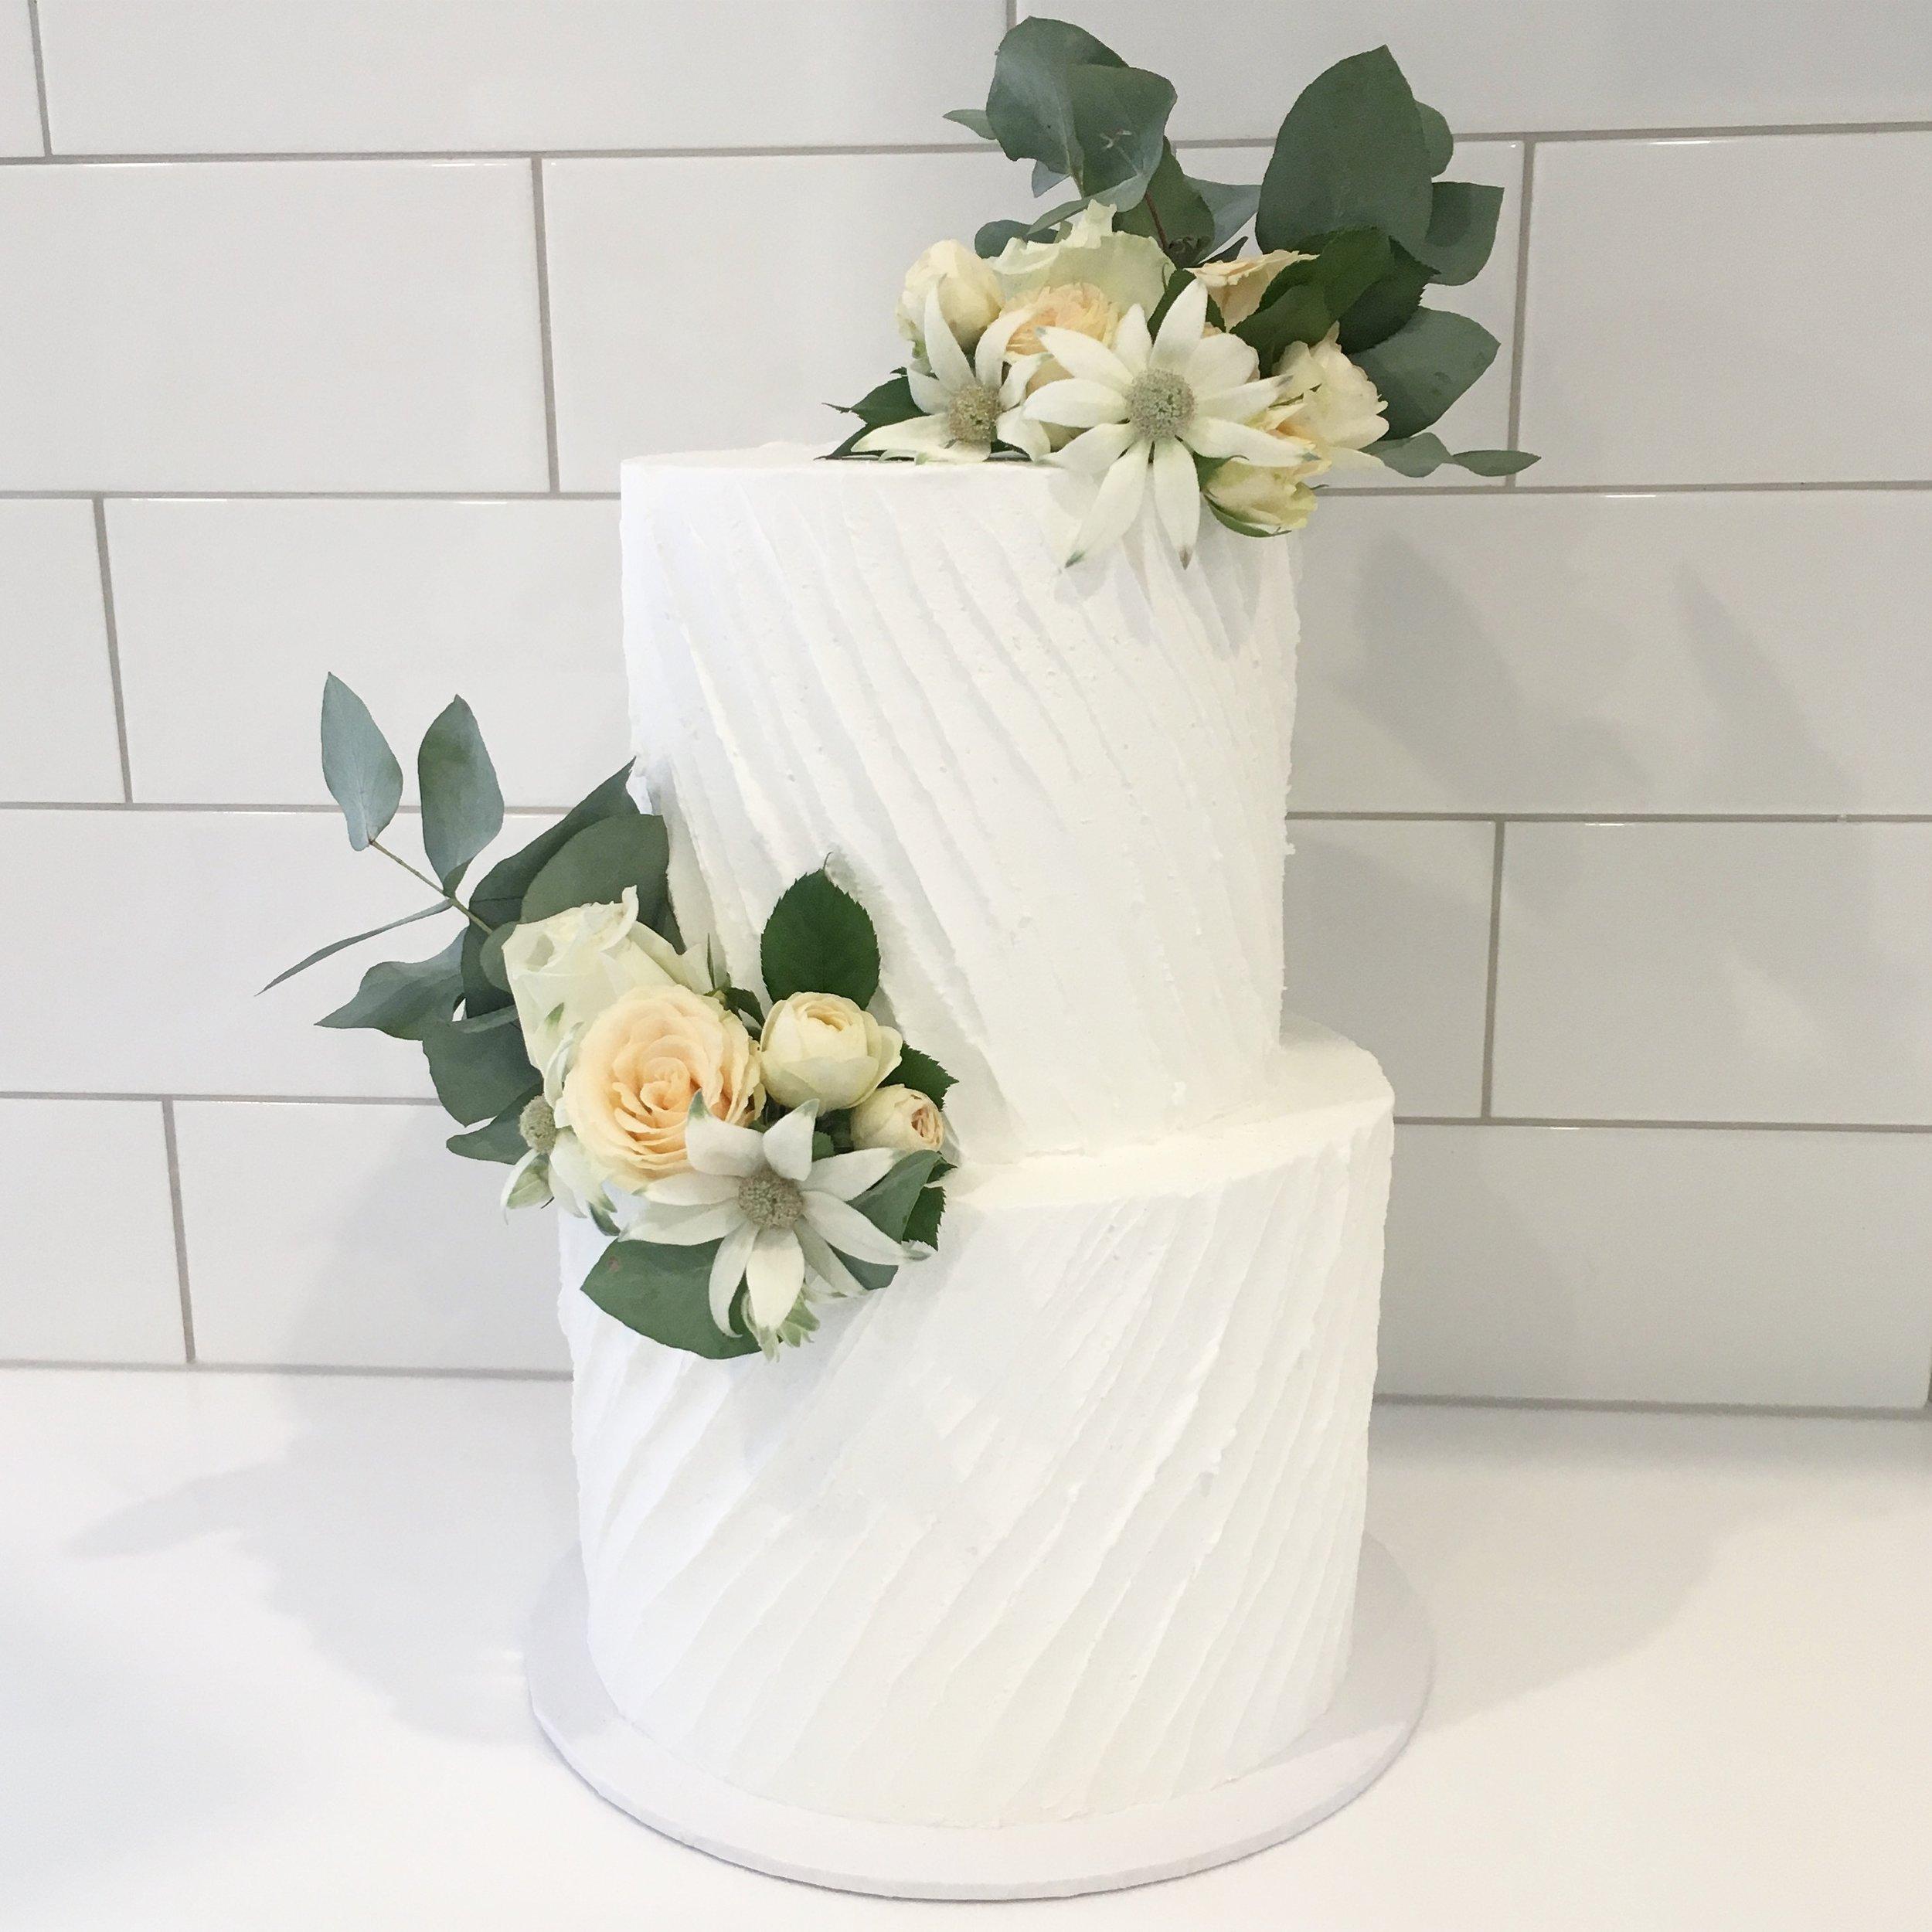 Copy of Classic Buttercream Cake